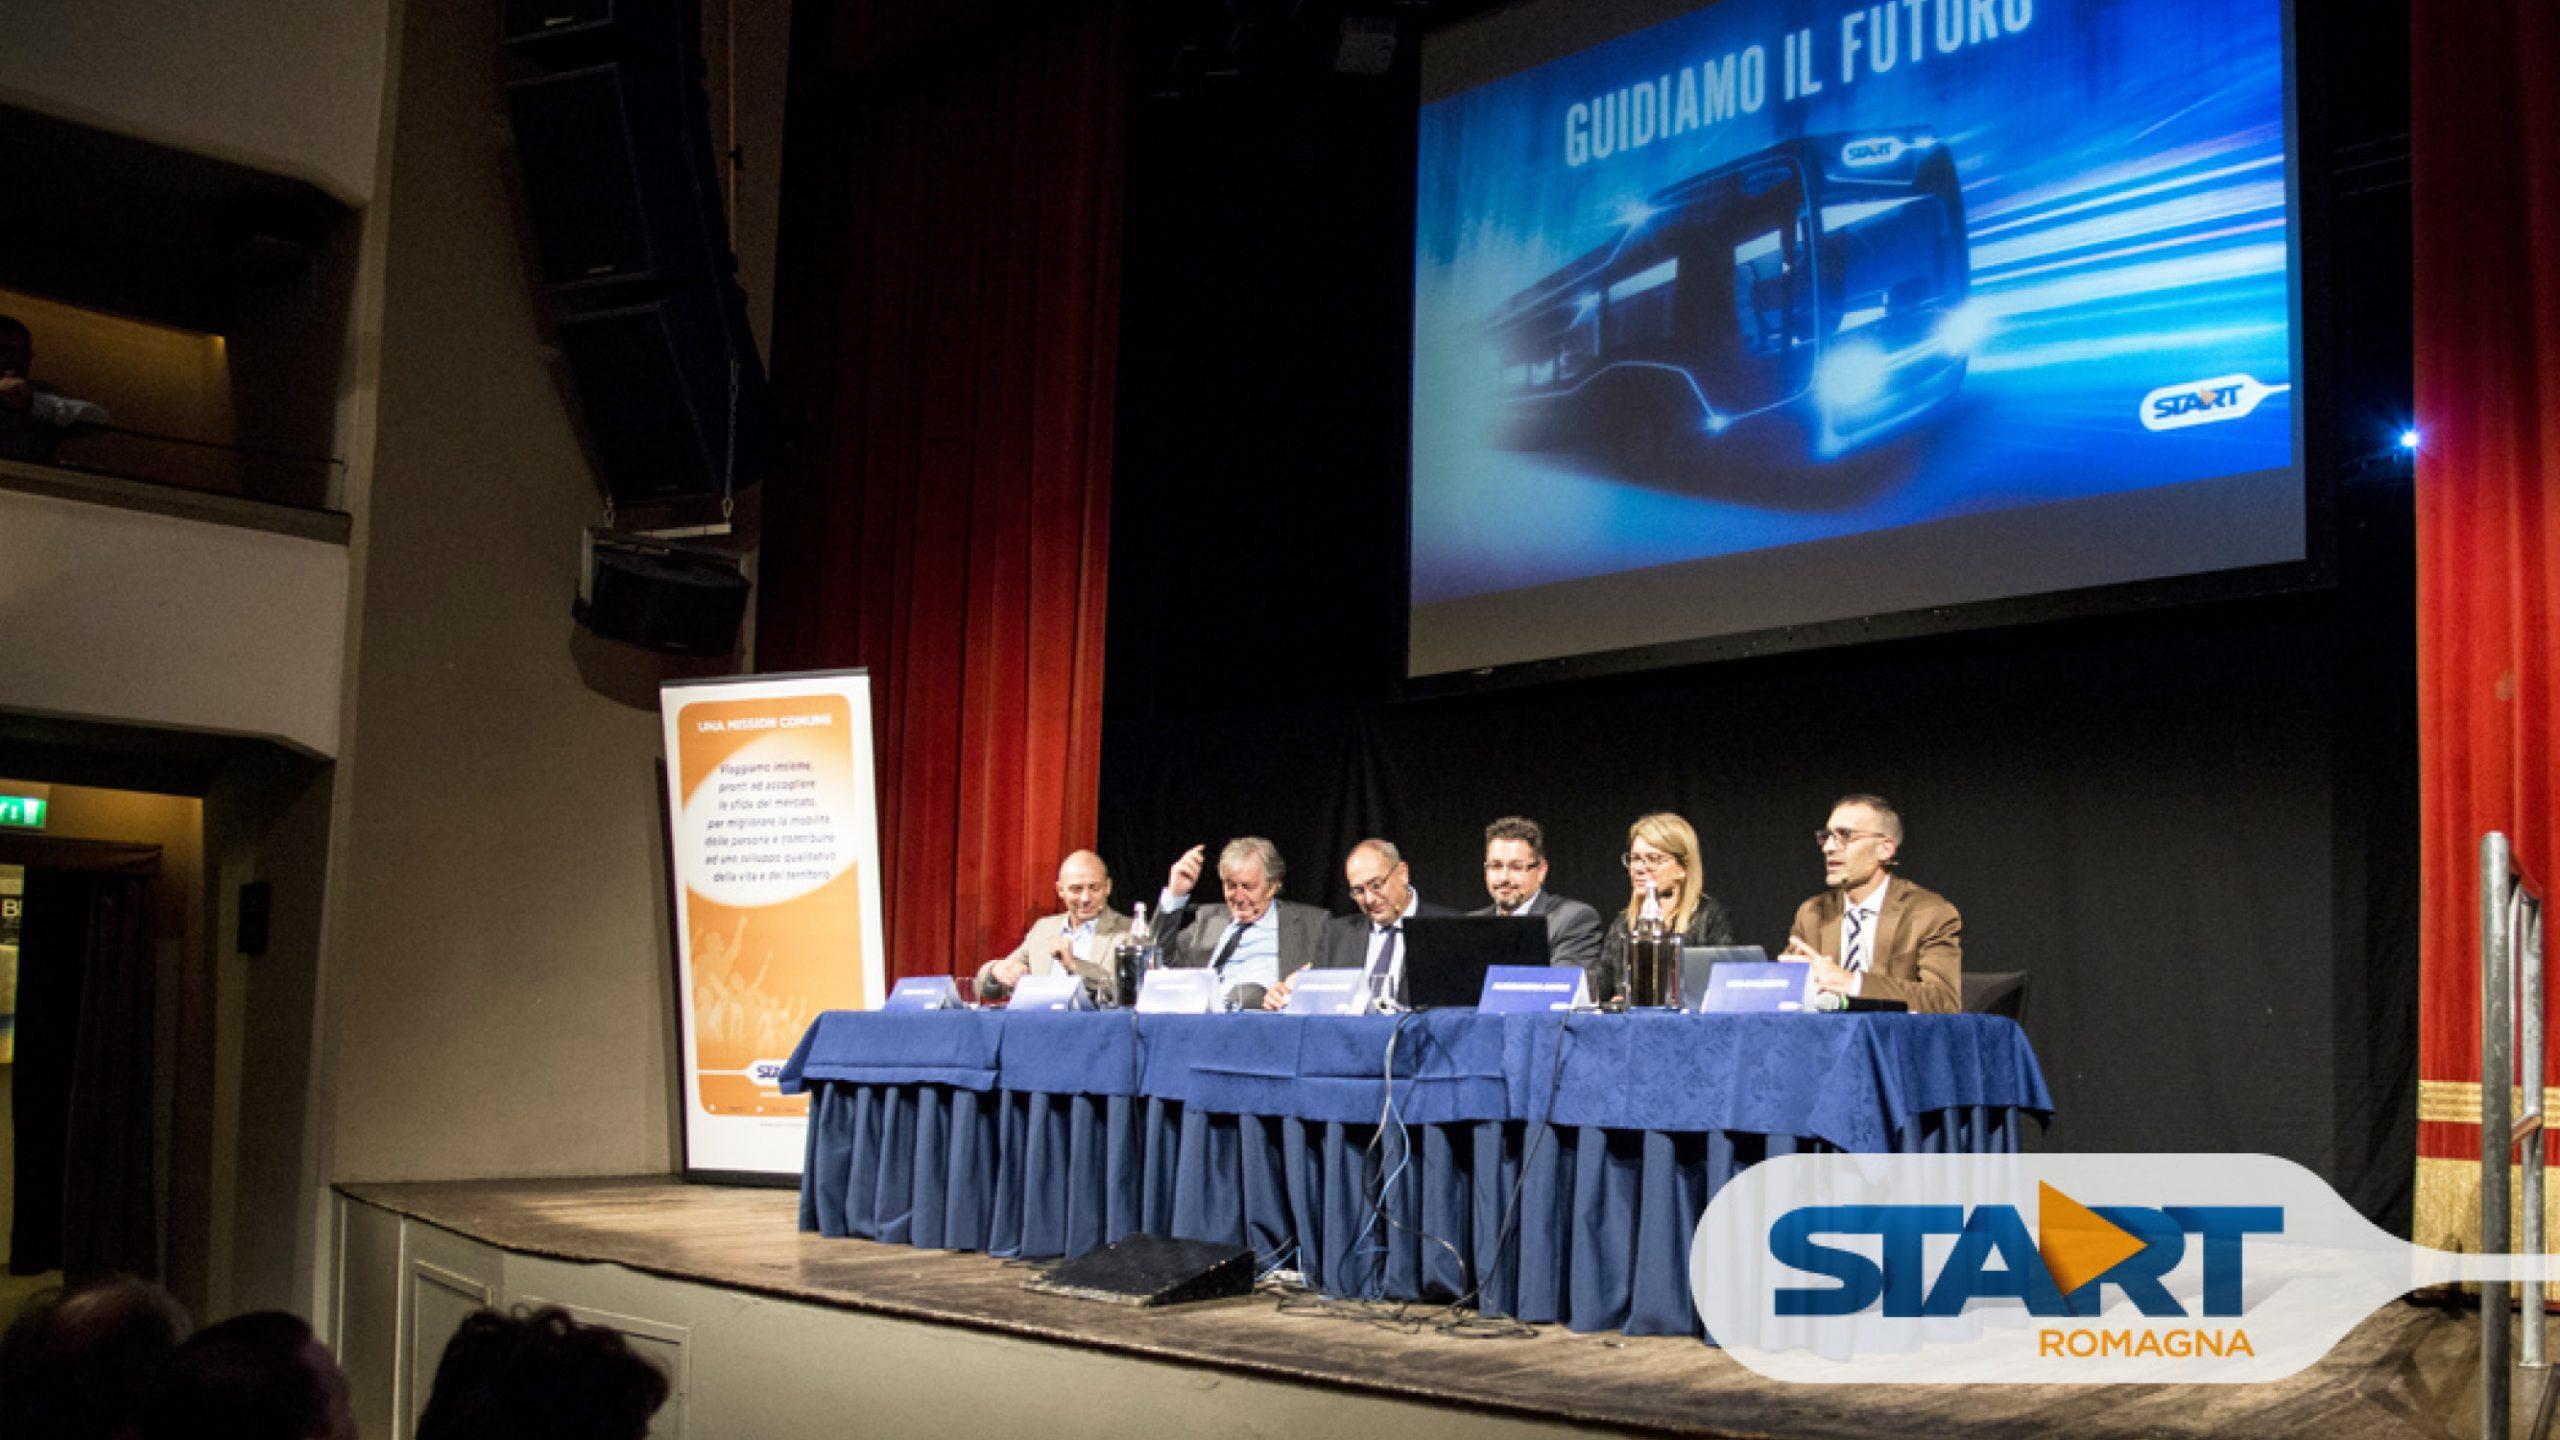 Menabò agenzia di comunicazione a Forlì - Evento START Romagna cover